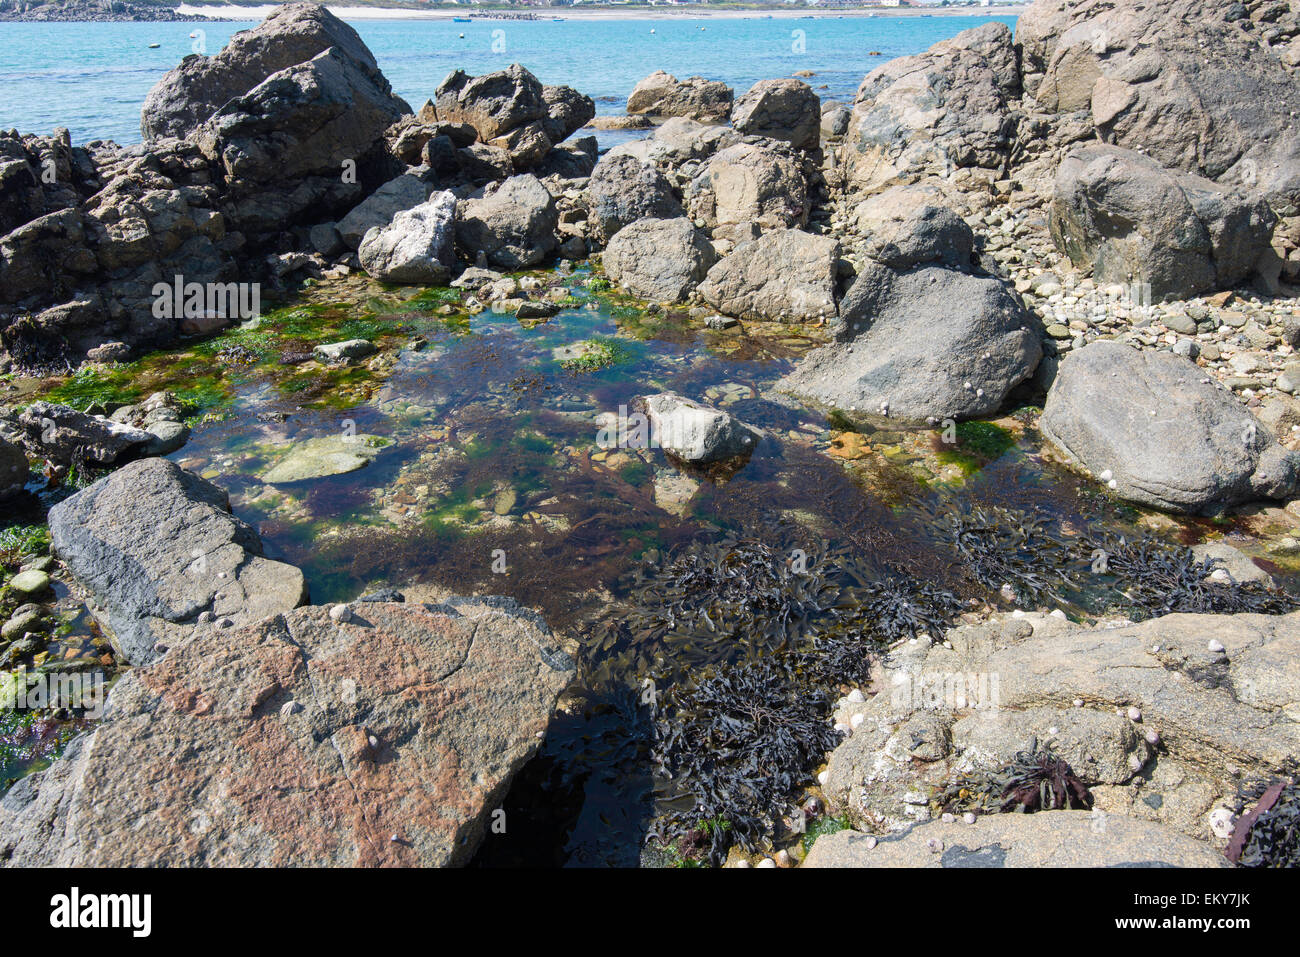 Rock intertidale extérieure. Photo Stock